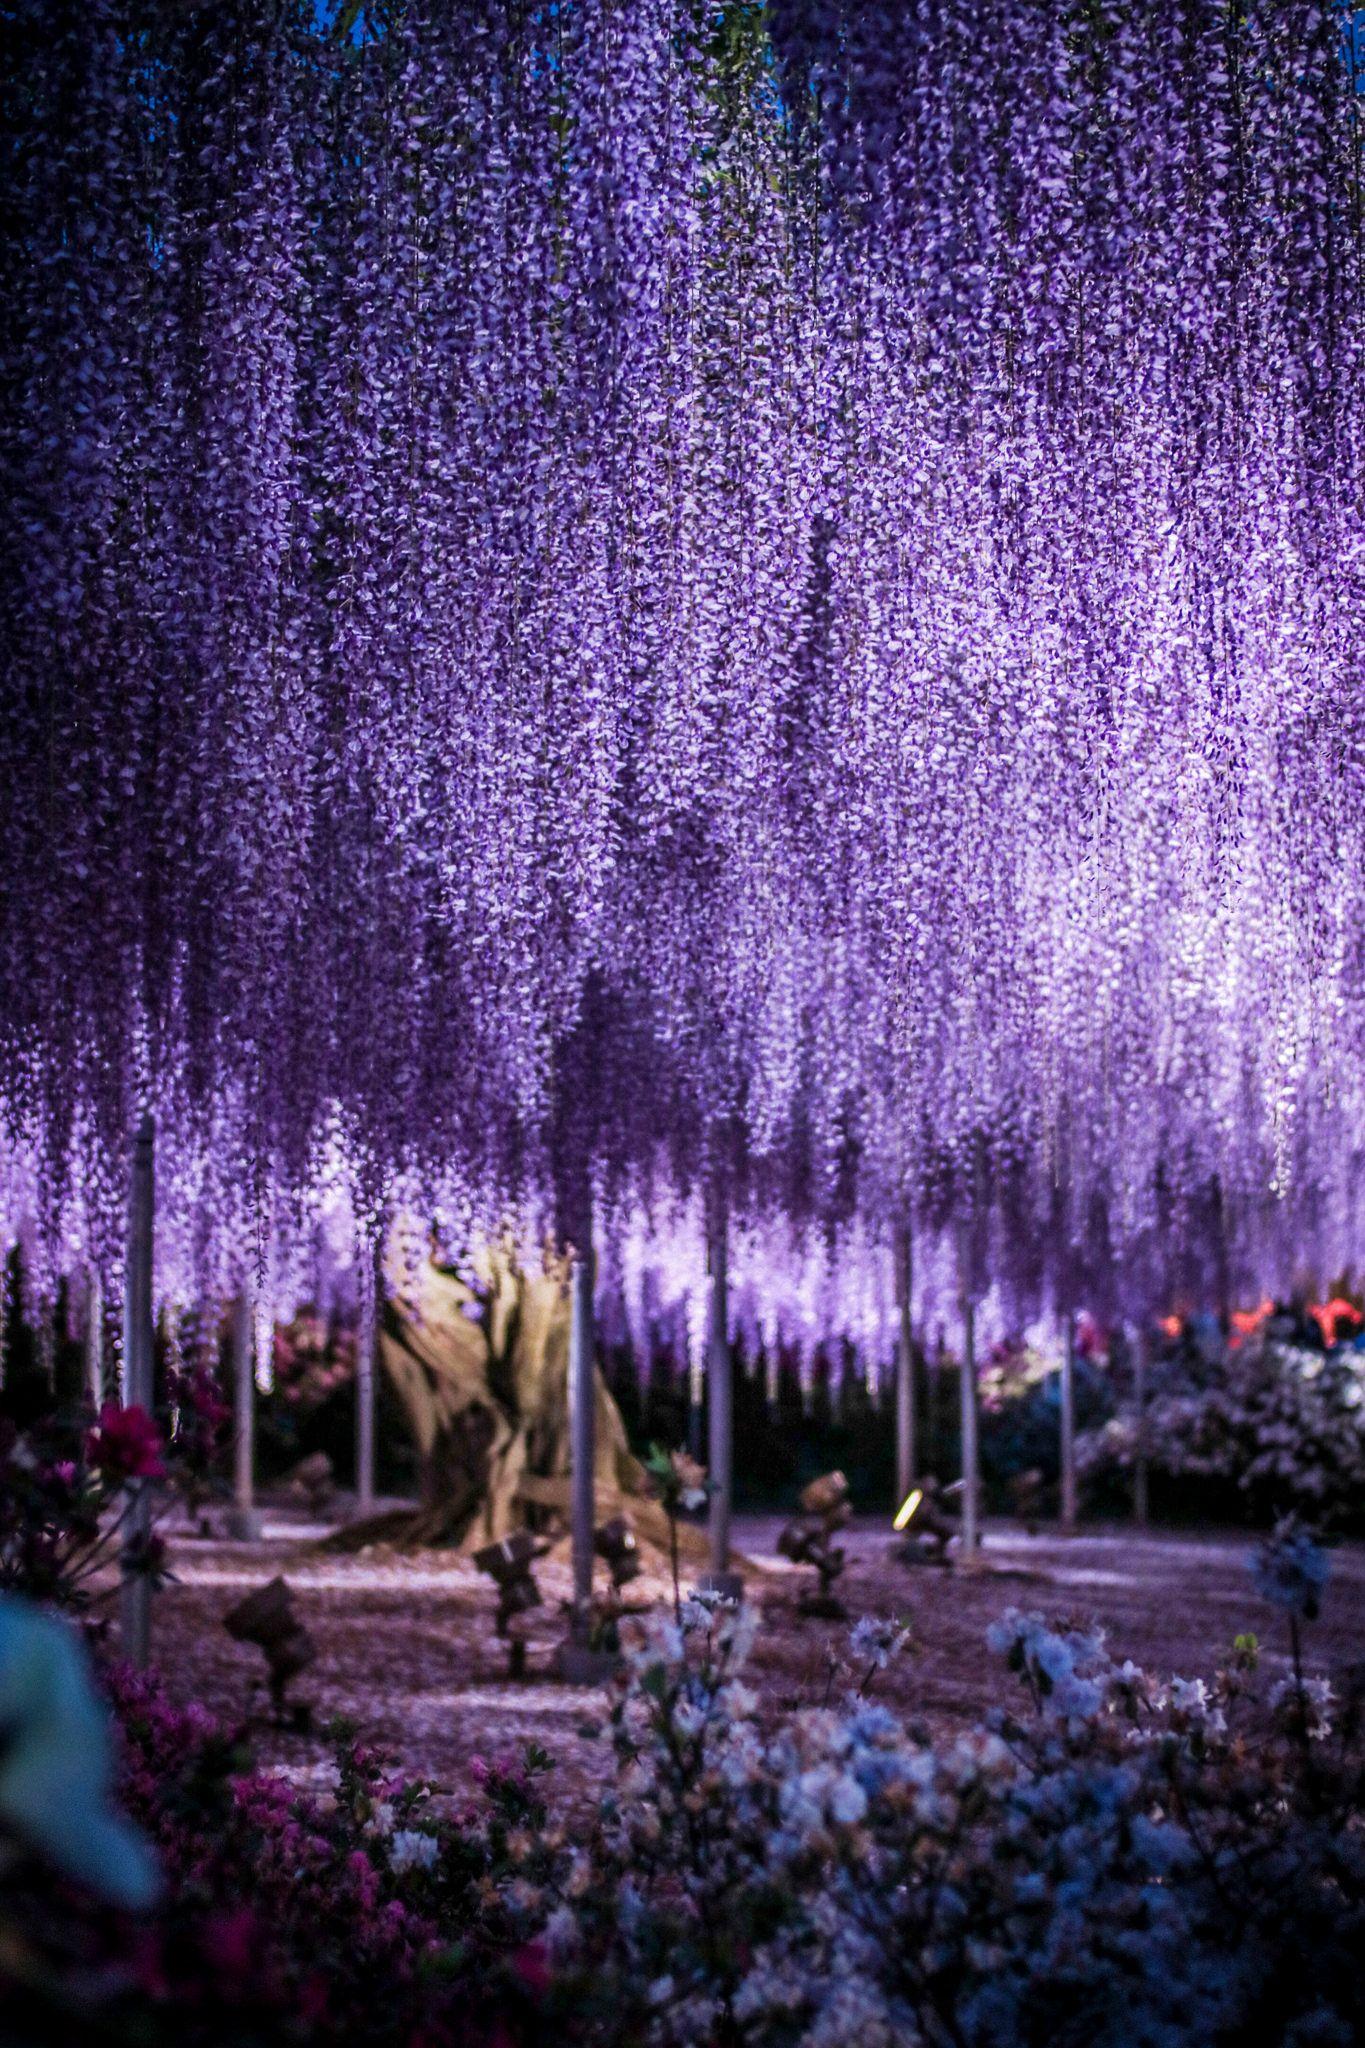 The Great Purple Wisteria Purple Wisteria Wisteria Wisteria Japan